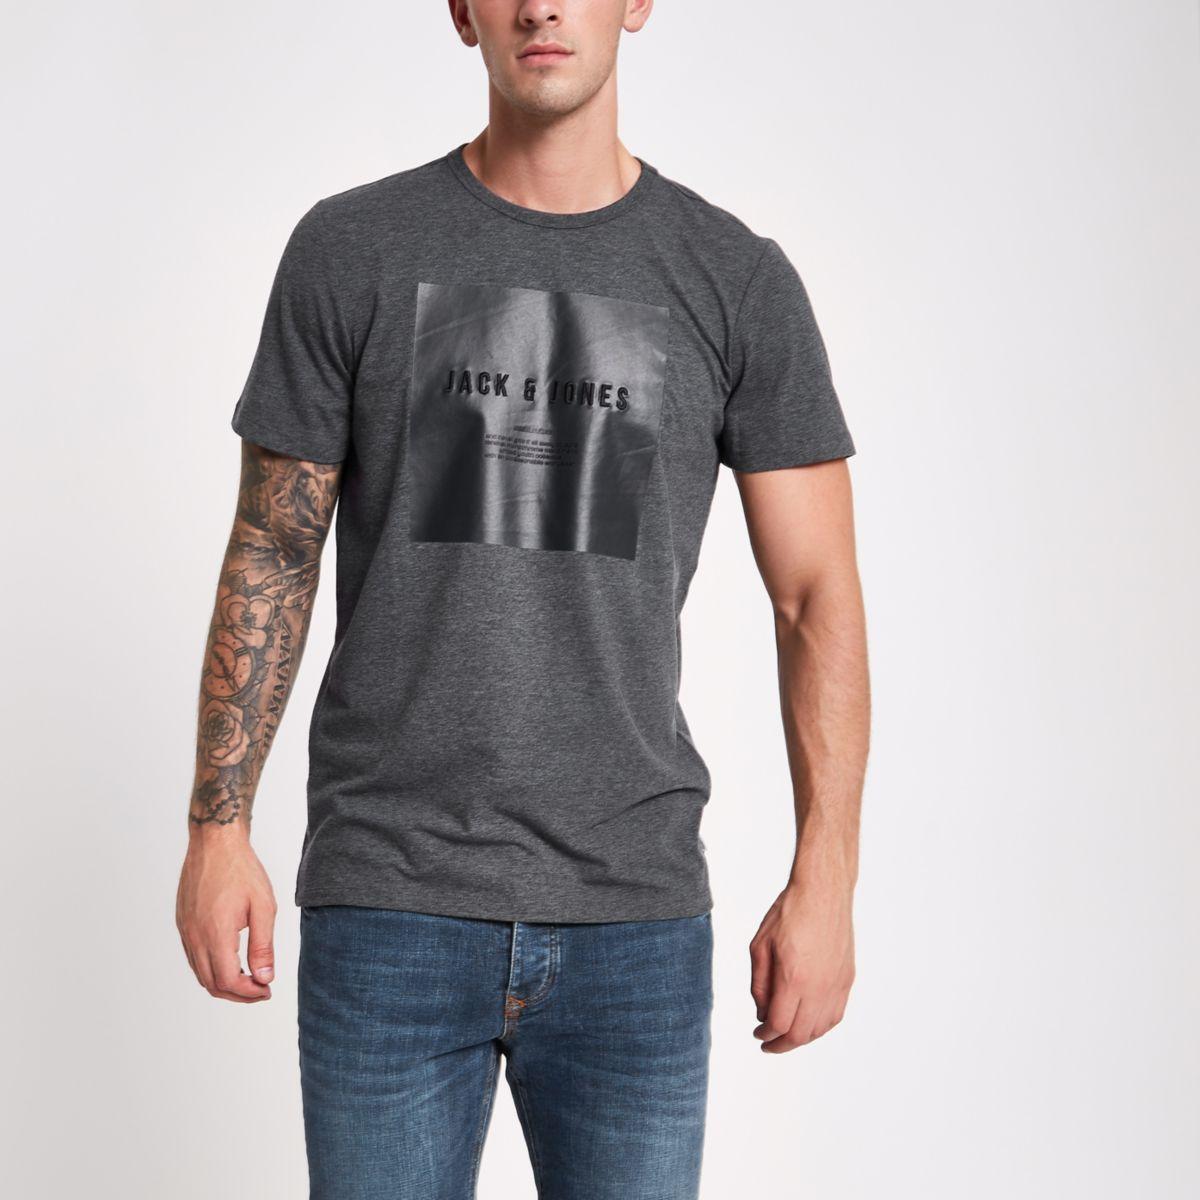 Jack & Jones navy 'create culture' T-shirt